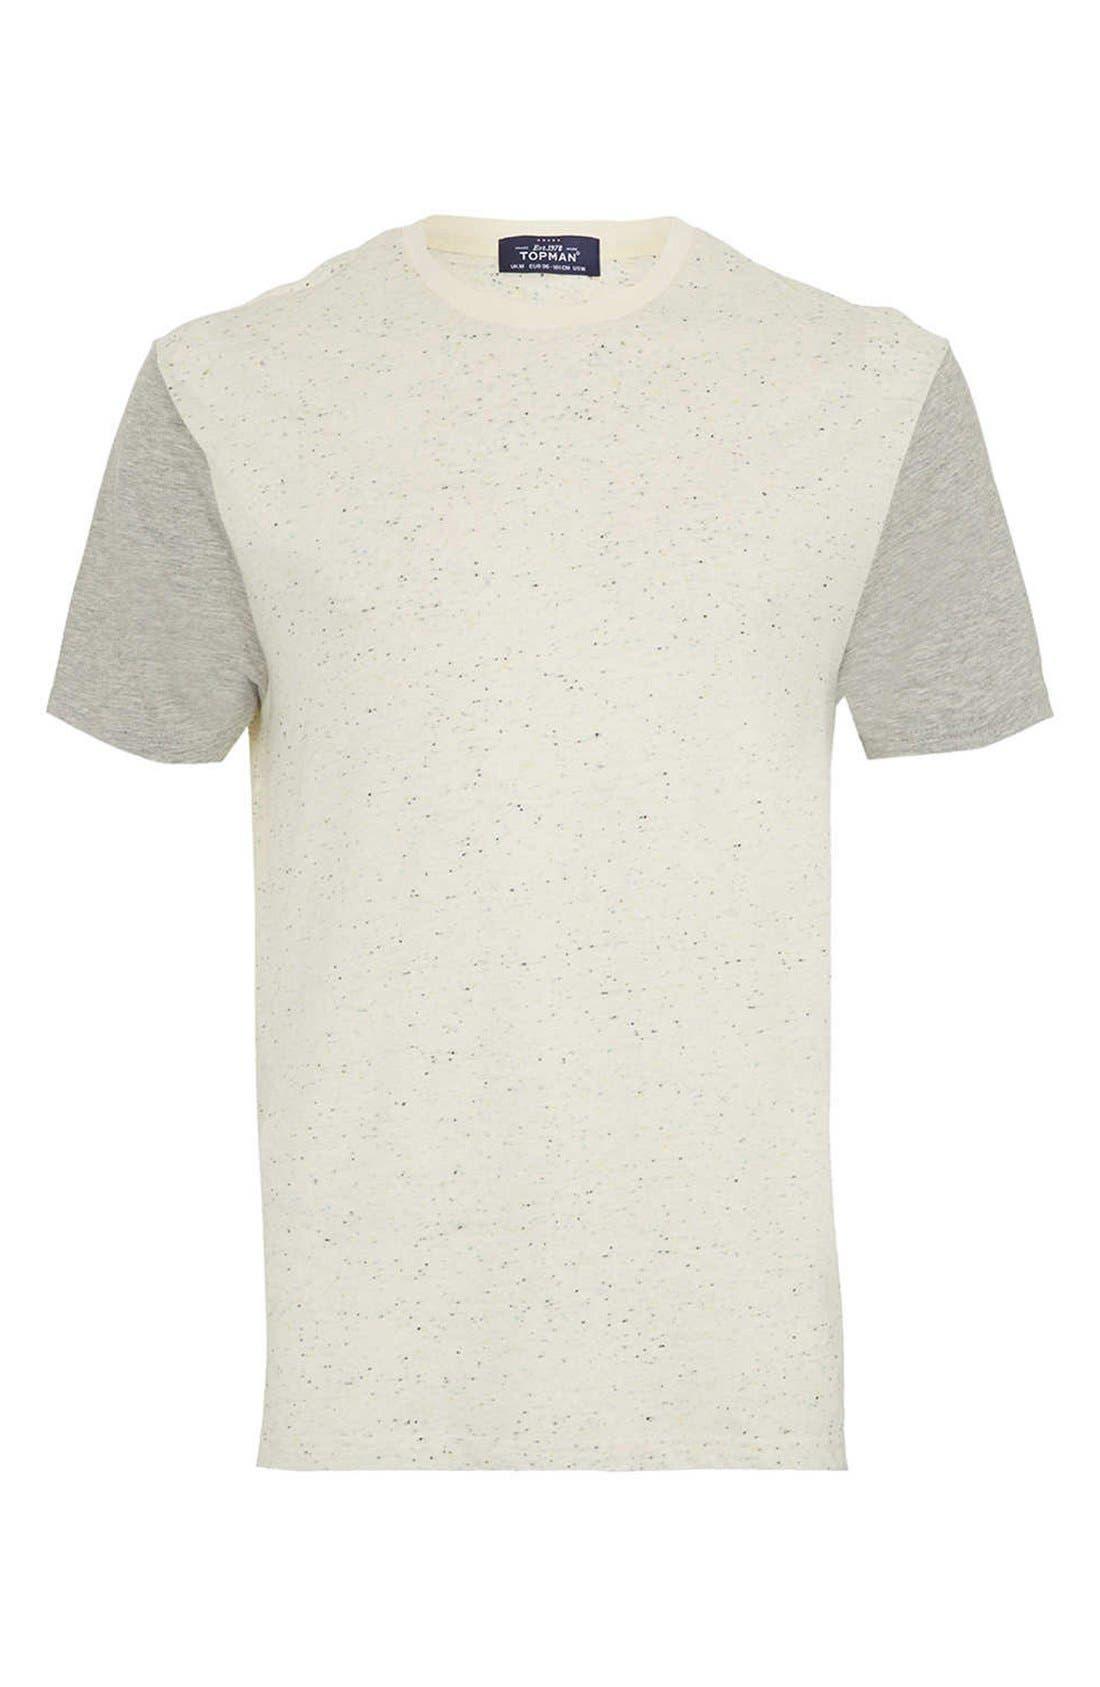 Main Image - Topman Nep Contrast T-Shirt